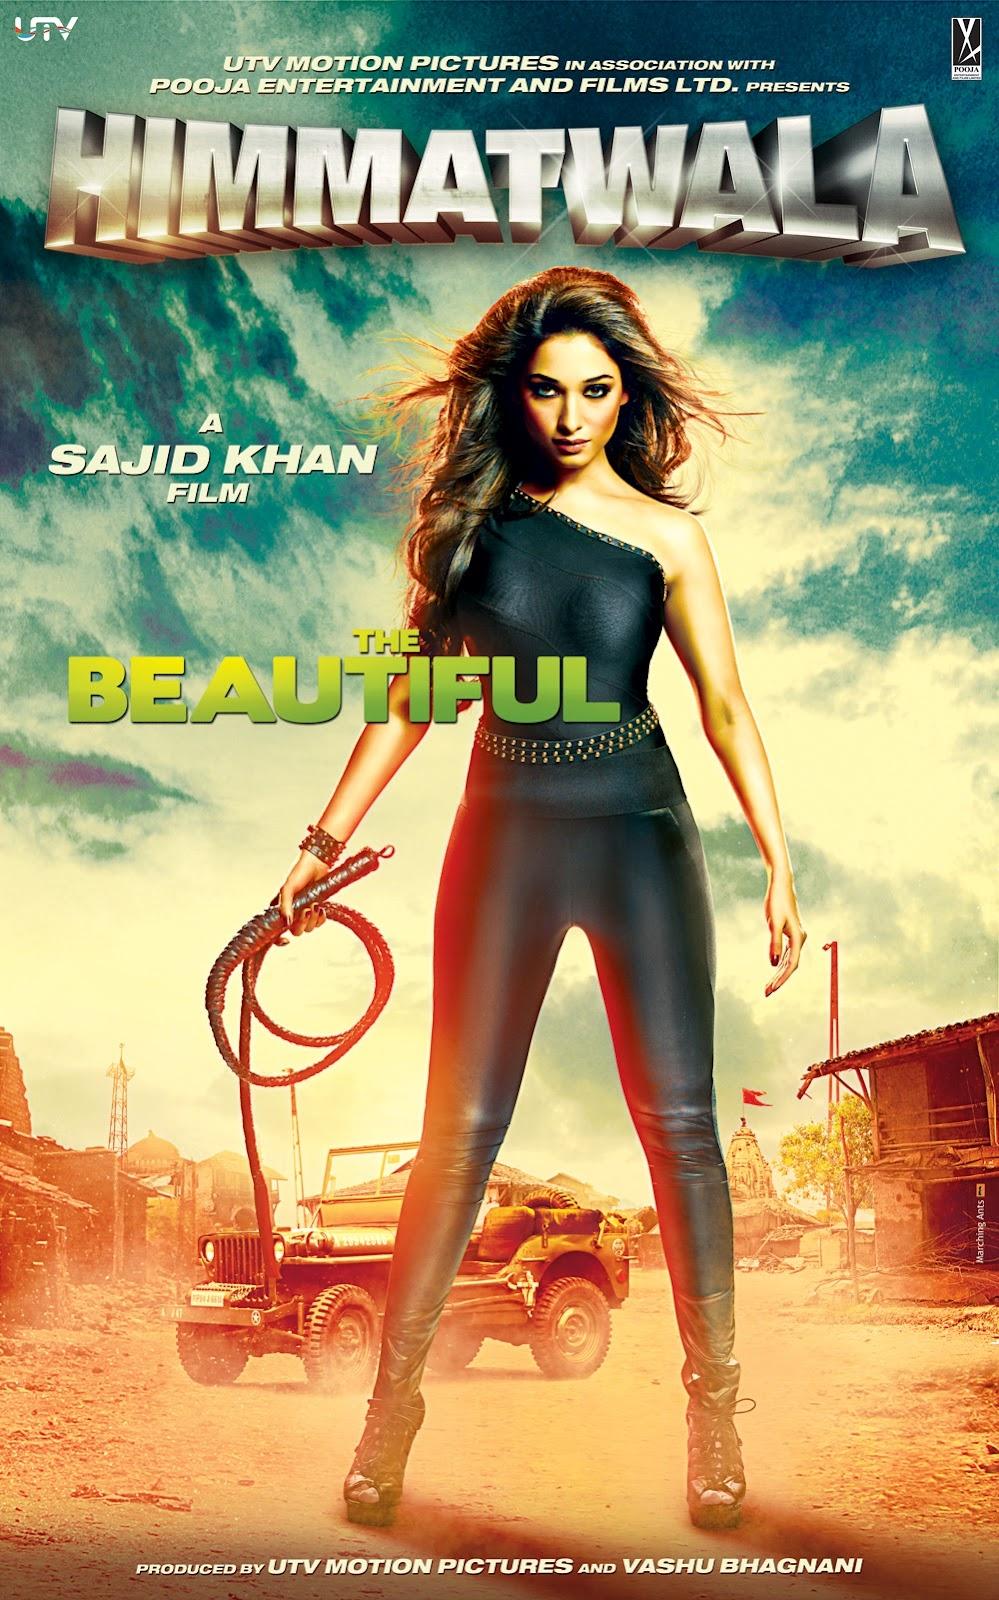 Himmatwala - Movie Poster #2 (Original)